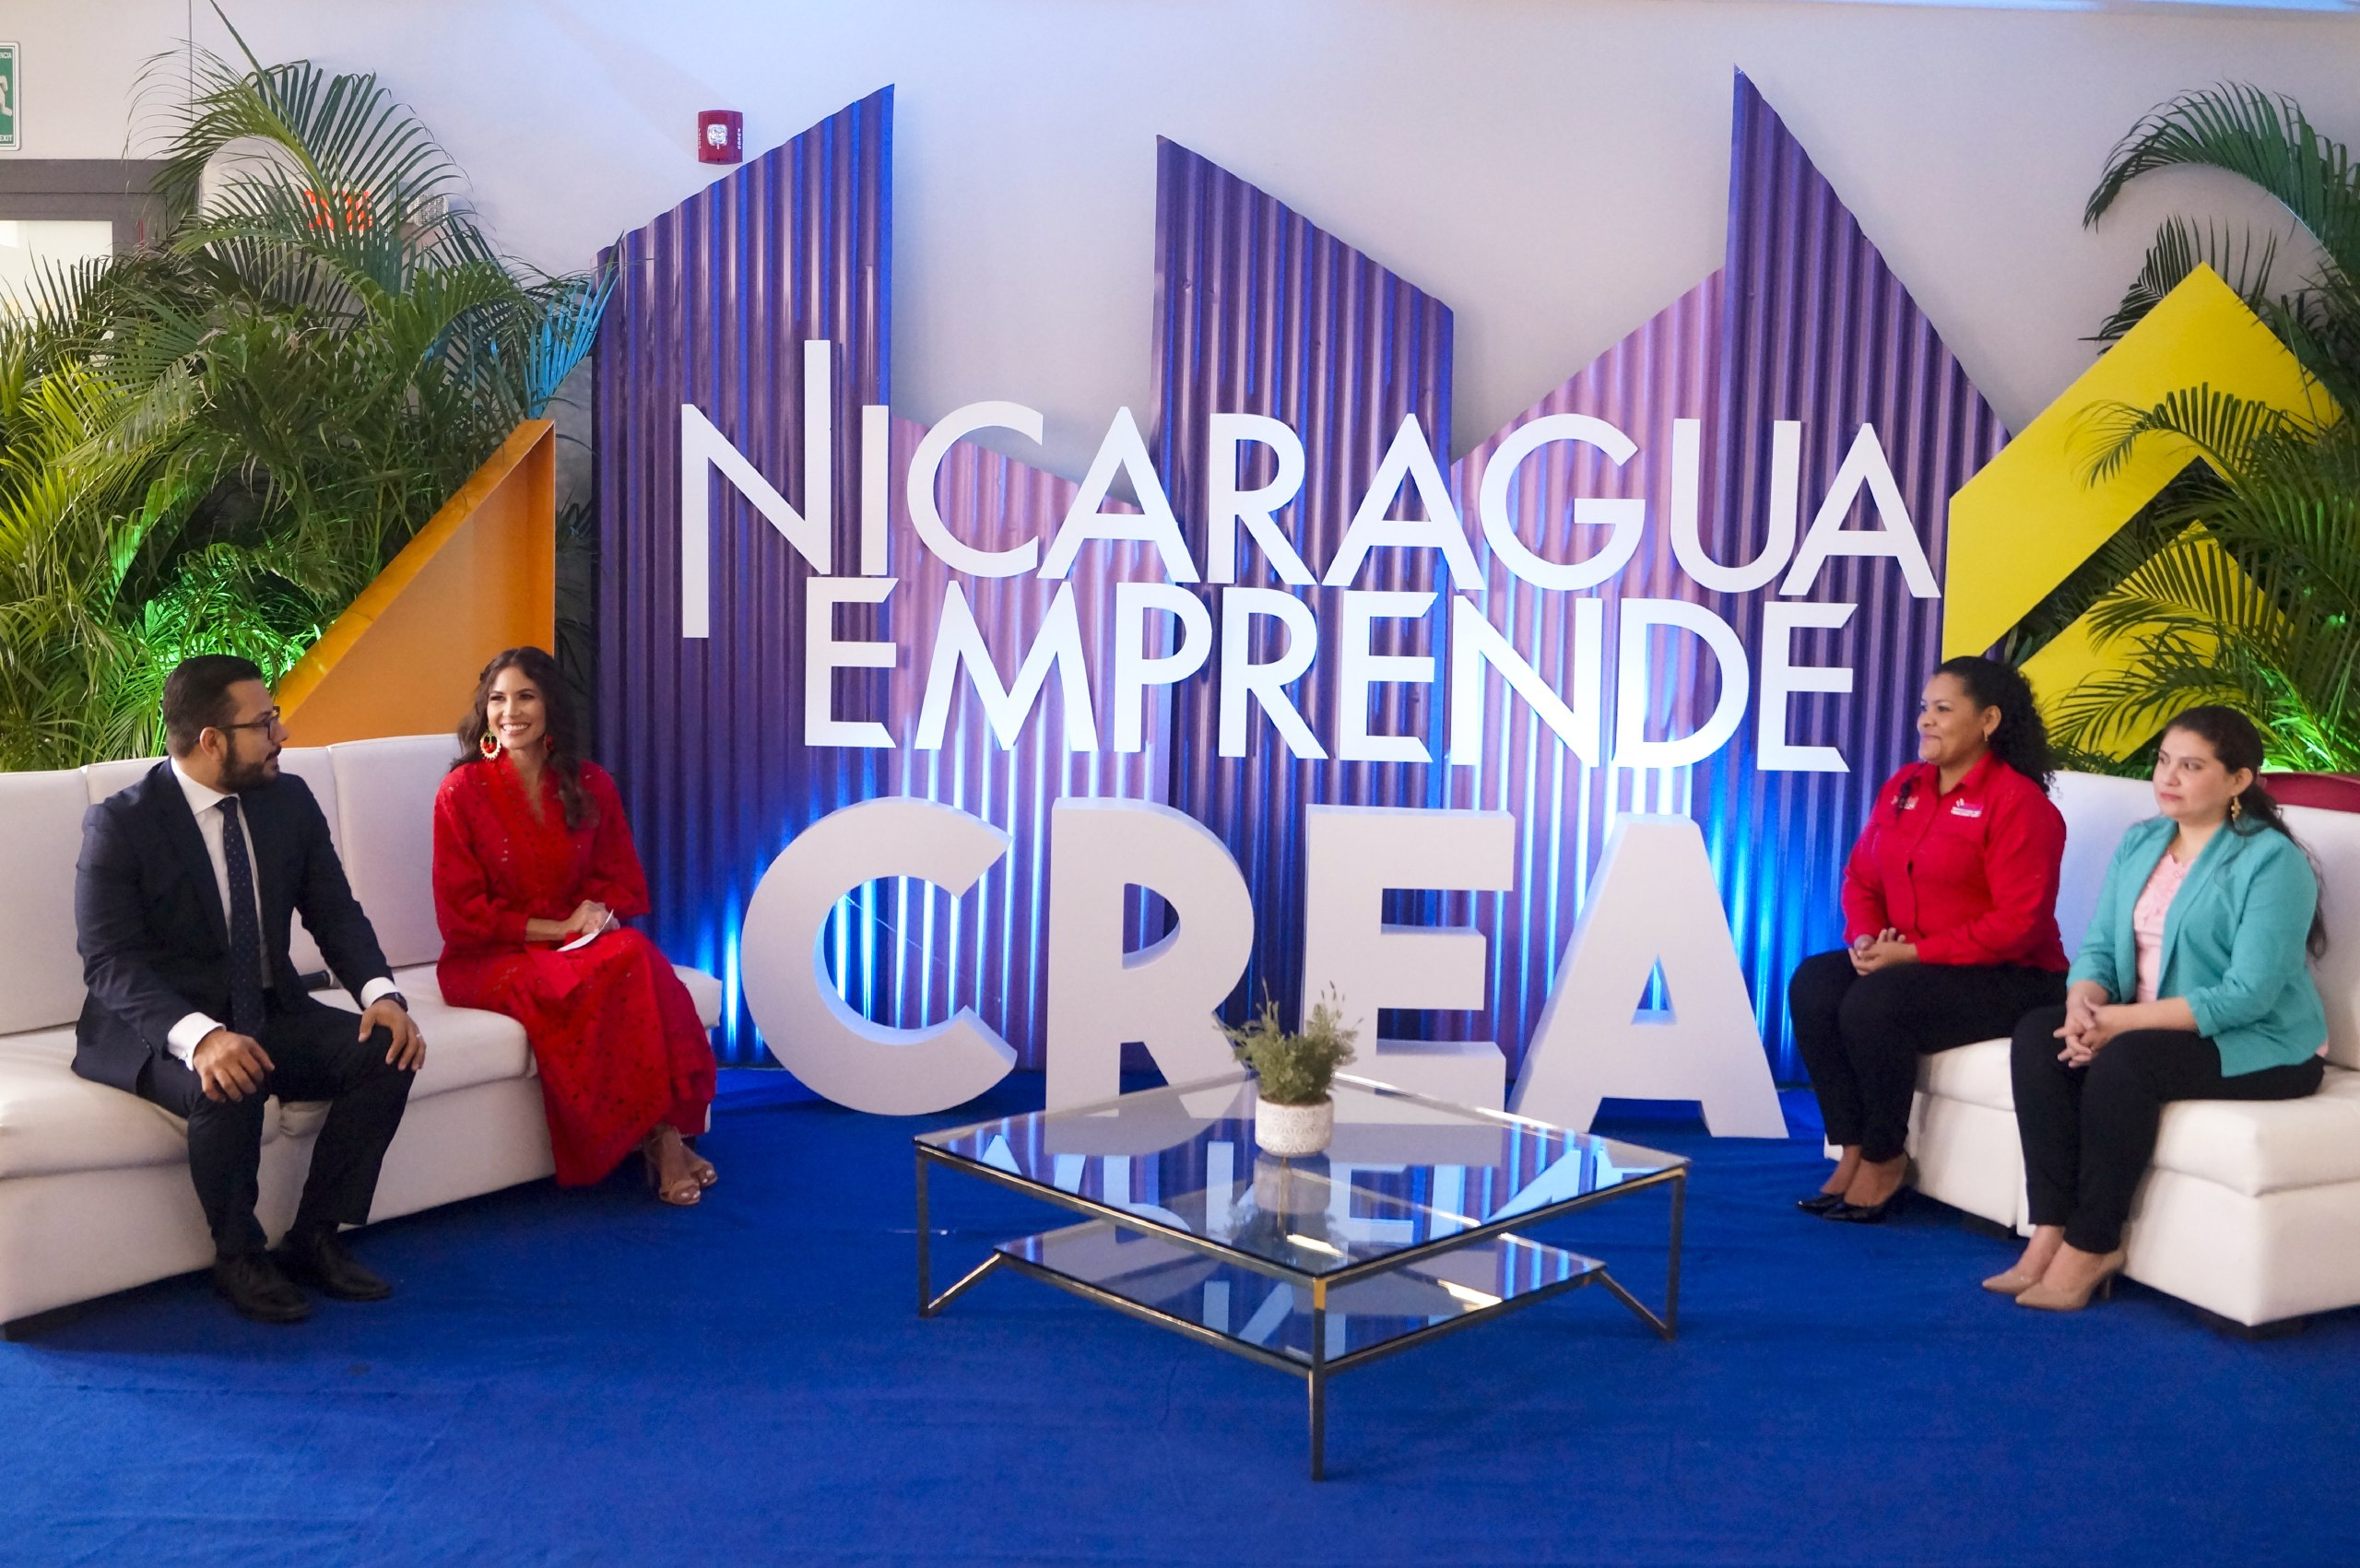 Estamos listos: ¡Nicaragua Emprende 2021!